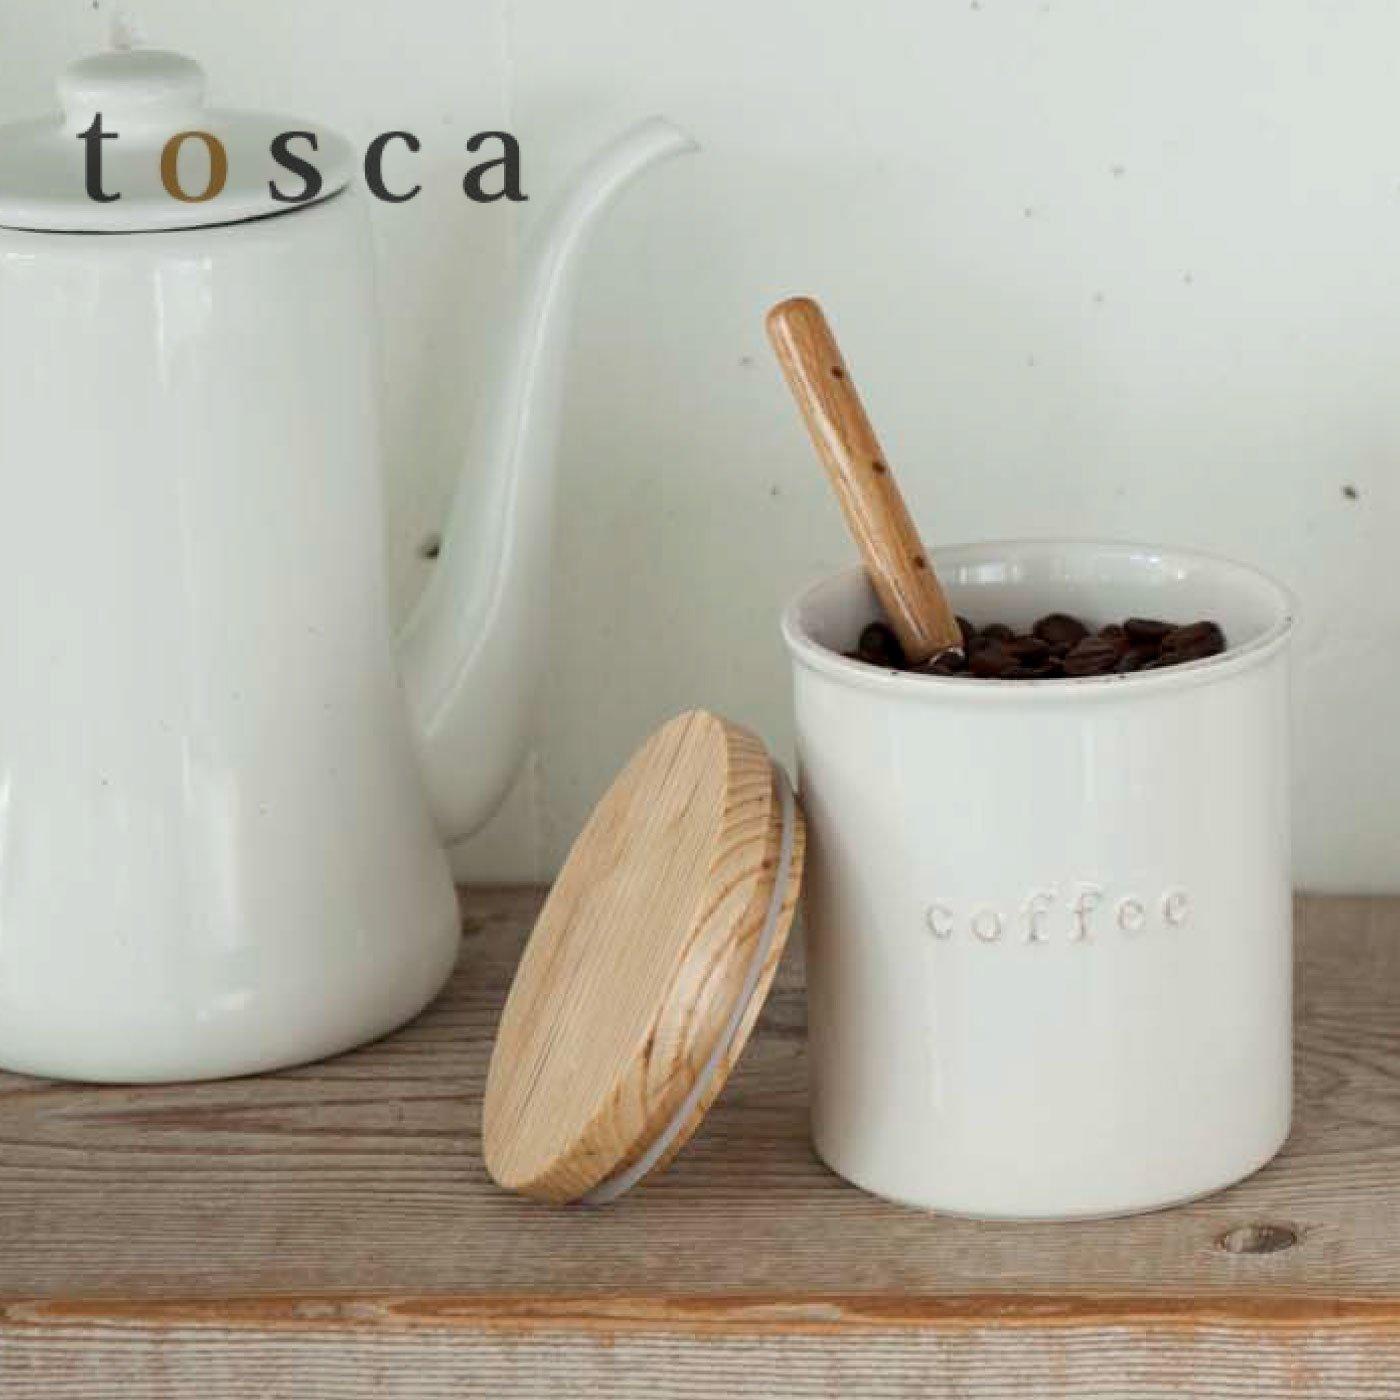 tosca 陶器キャニスター コーヒー